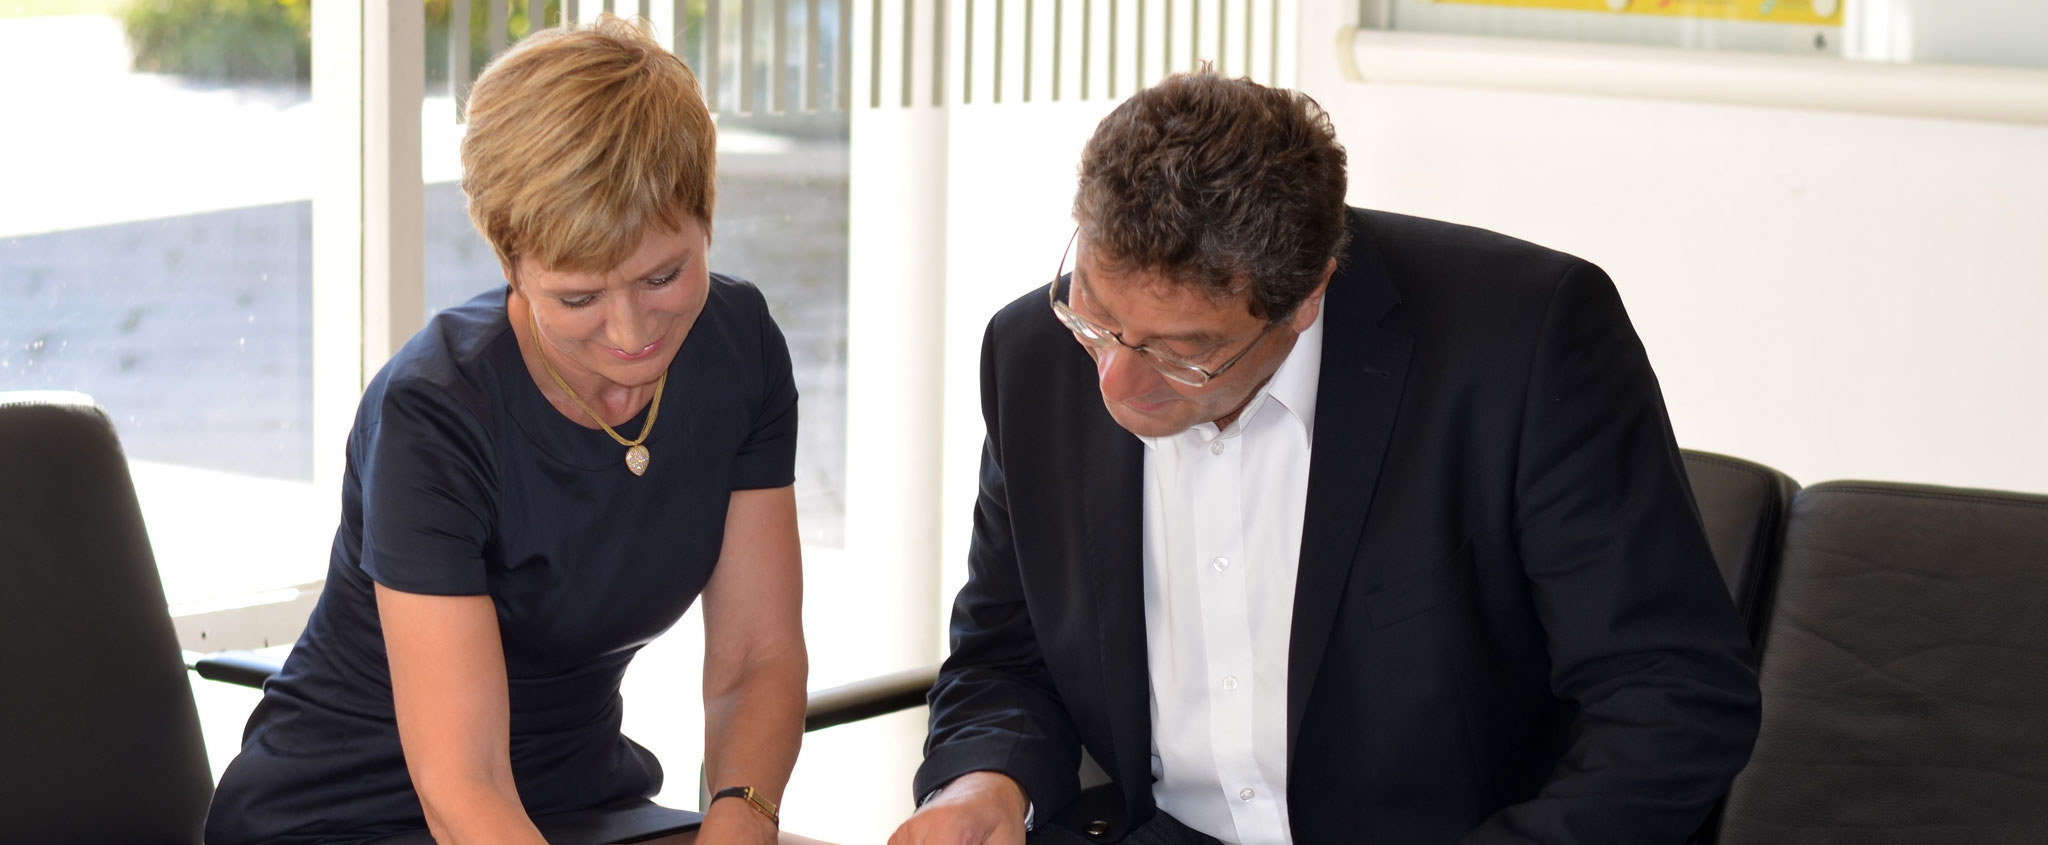 Elke Kirchner berät Unternehmer